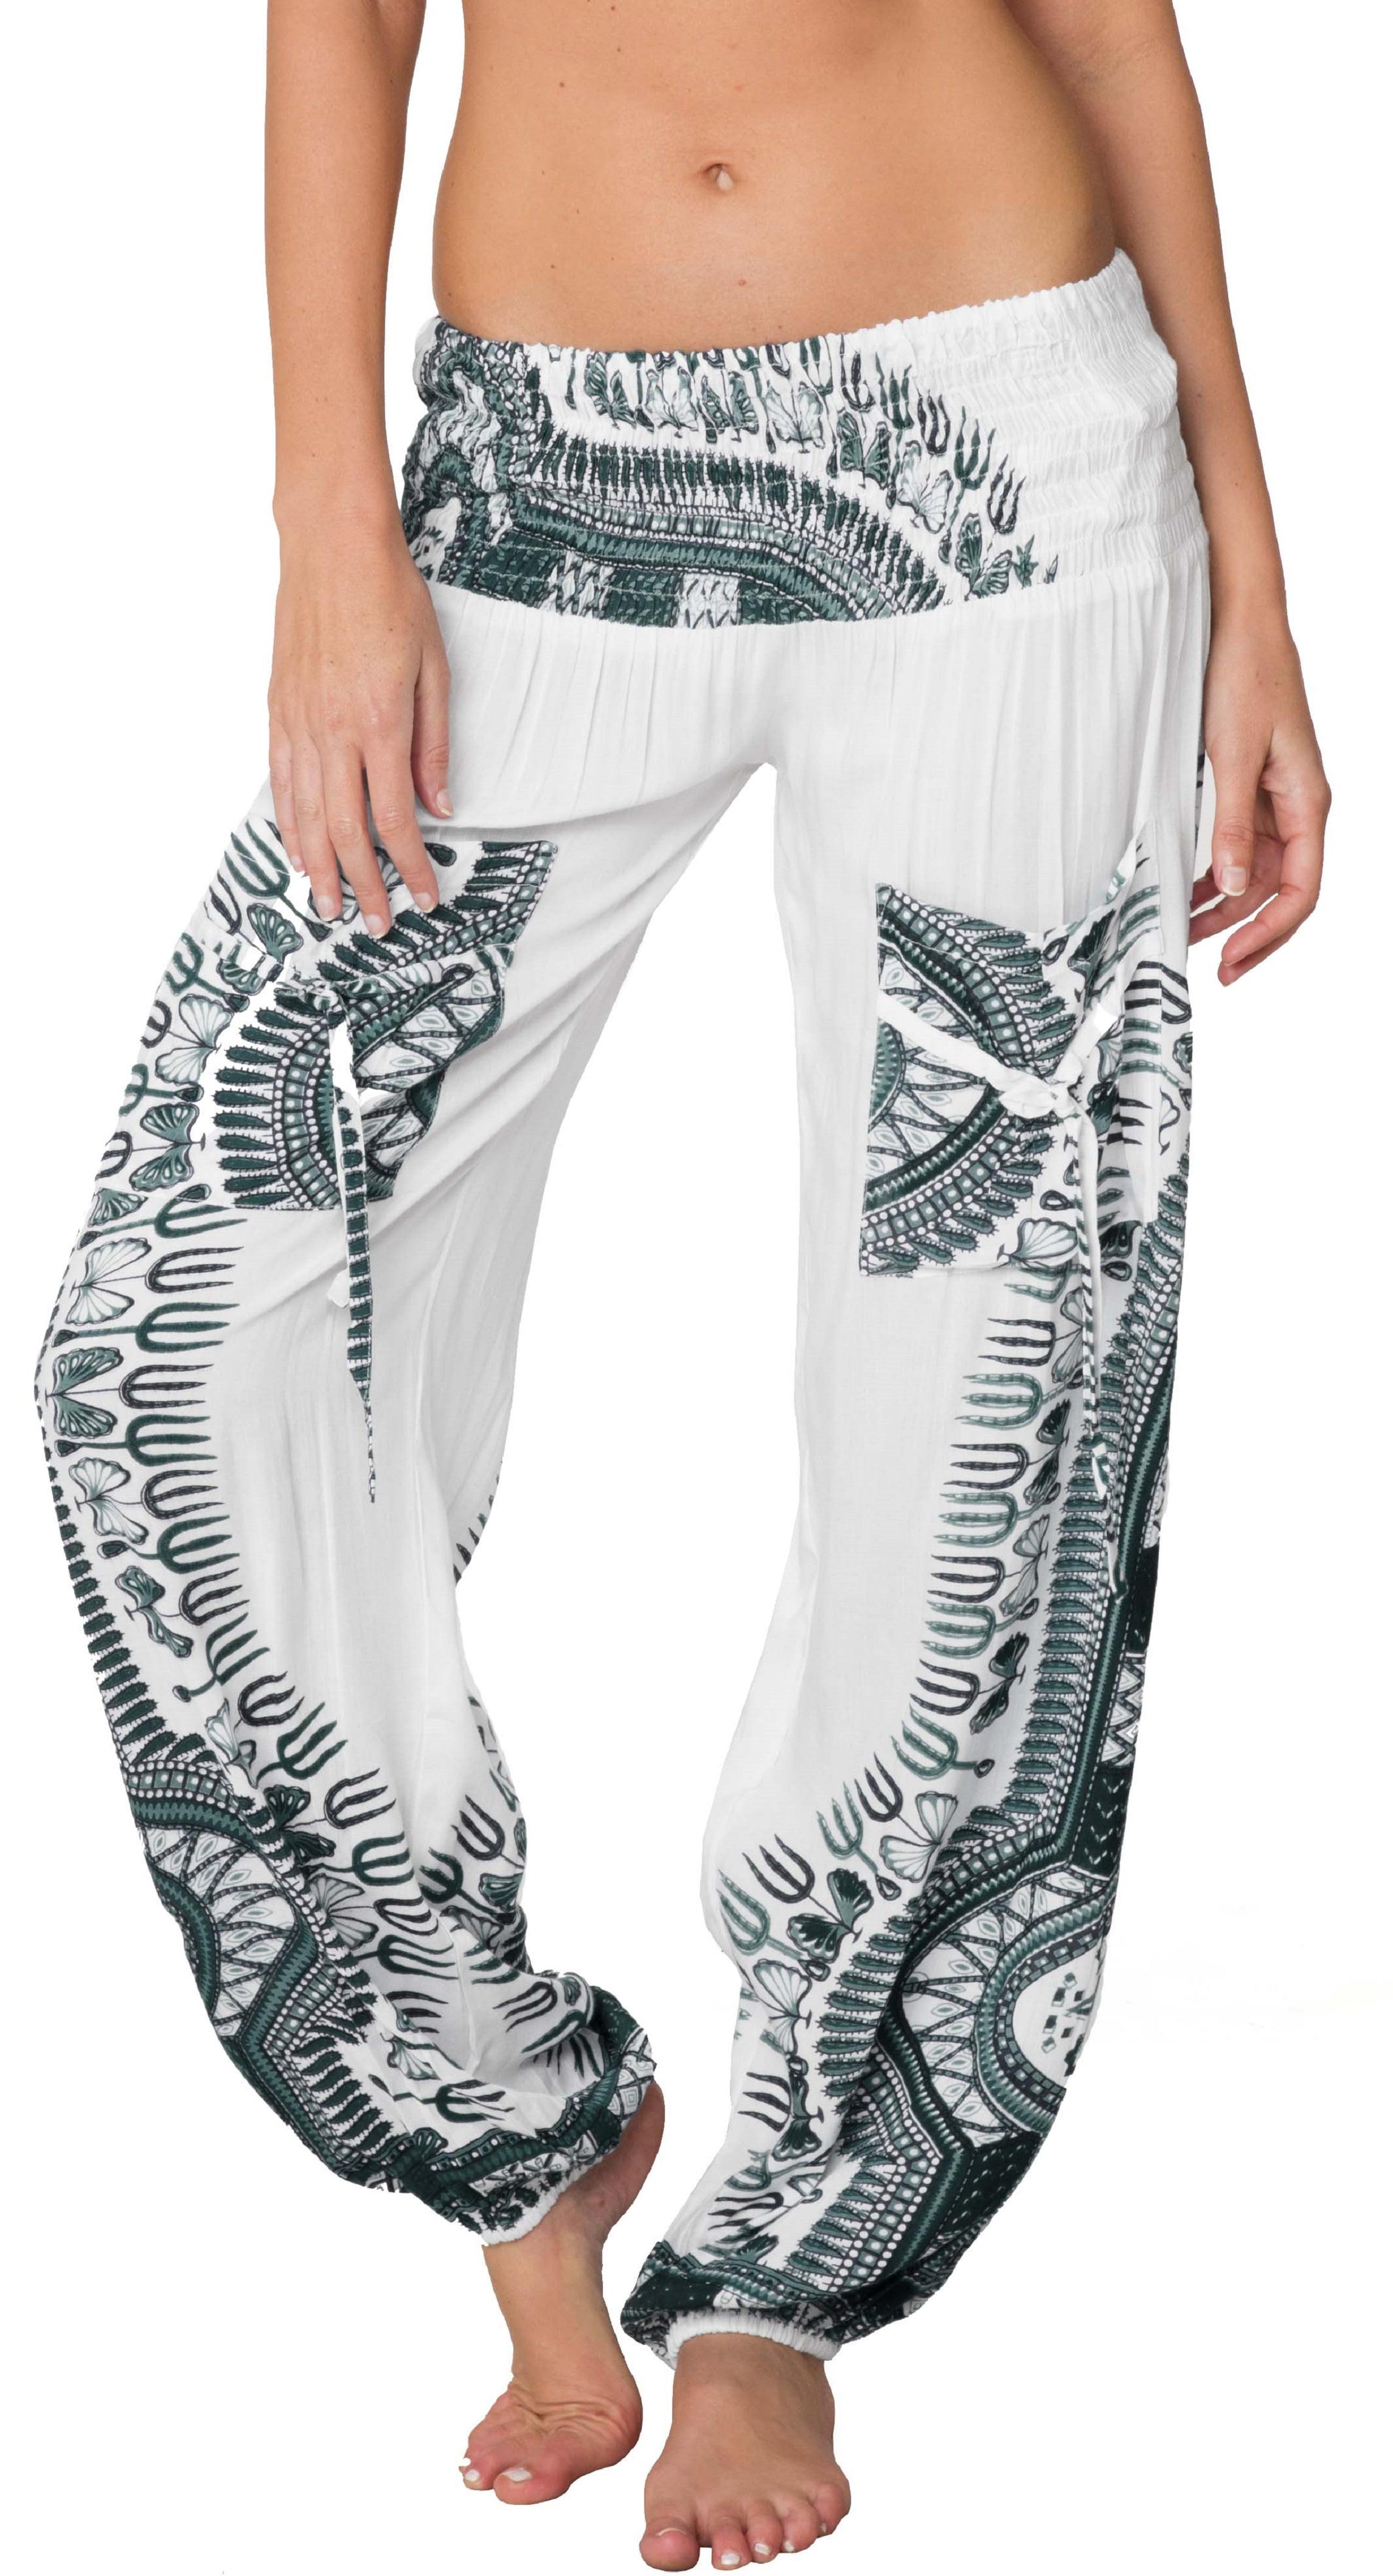 Bohemian Balloon Pirates PantS,sleeping wear,Comfortable Bottoms,Soft Bottoms Loungewear Comfy Housewear Flowy Yoga Pants-Hippie Trousers